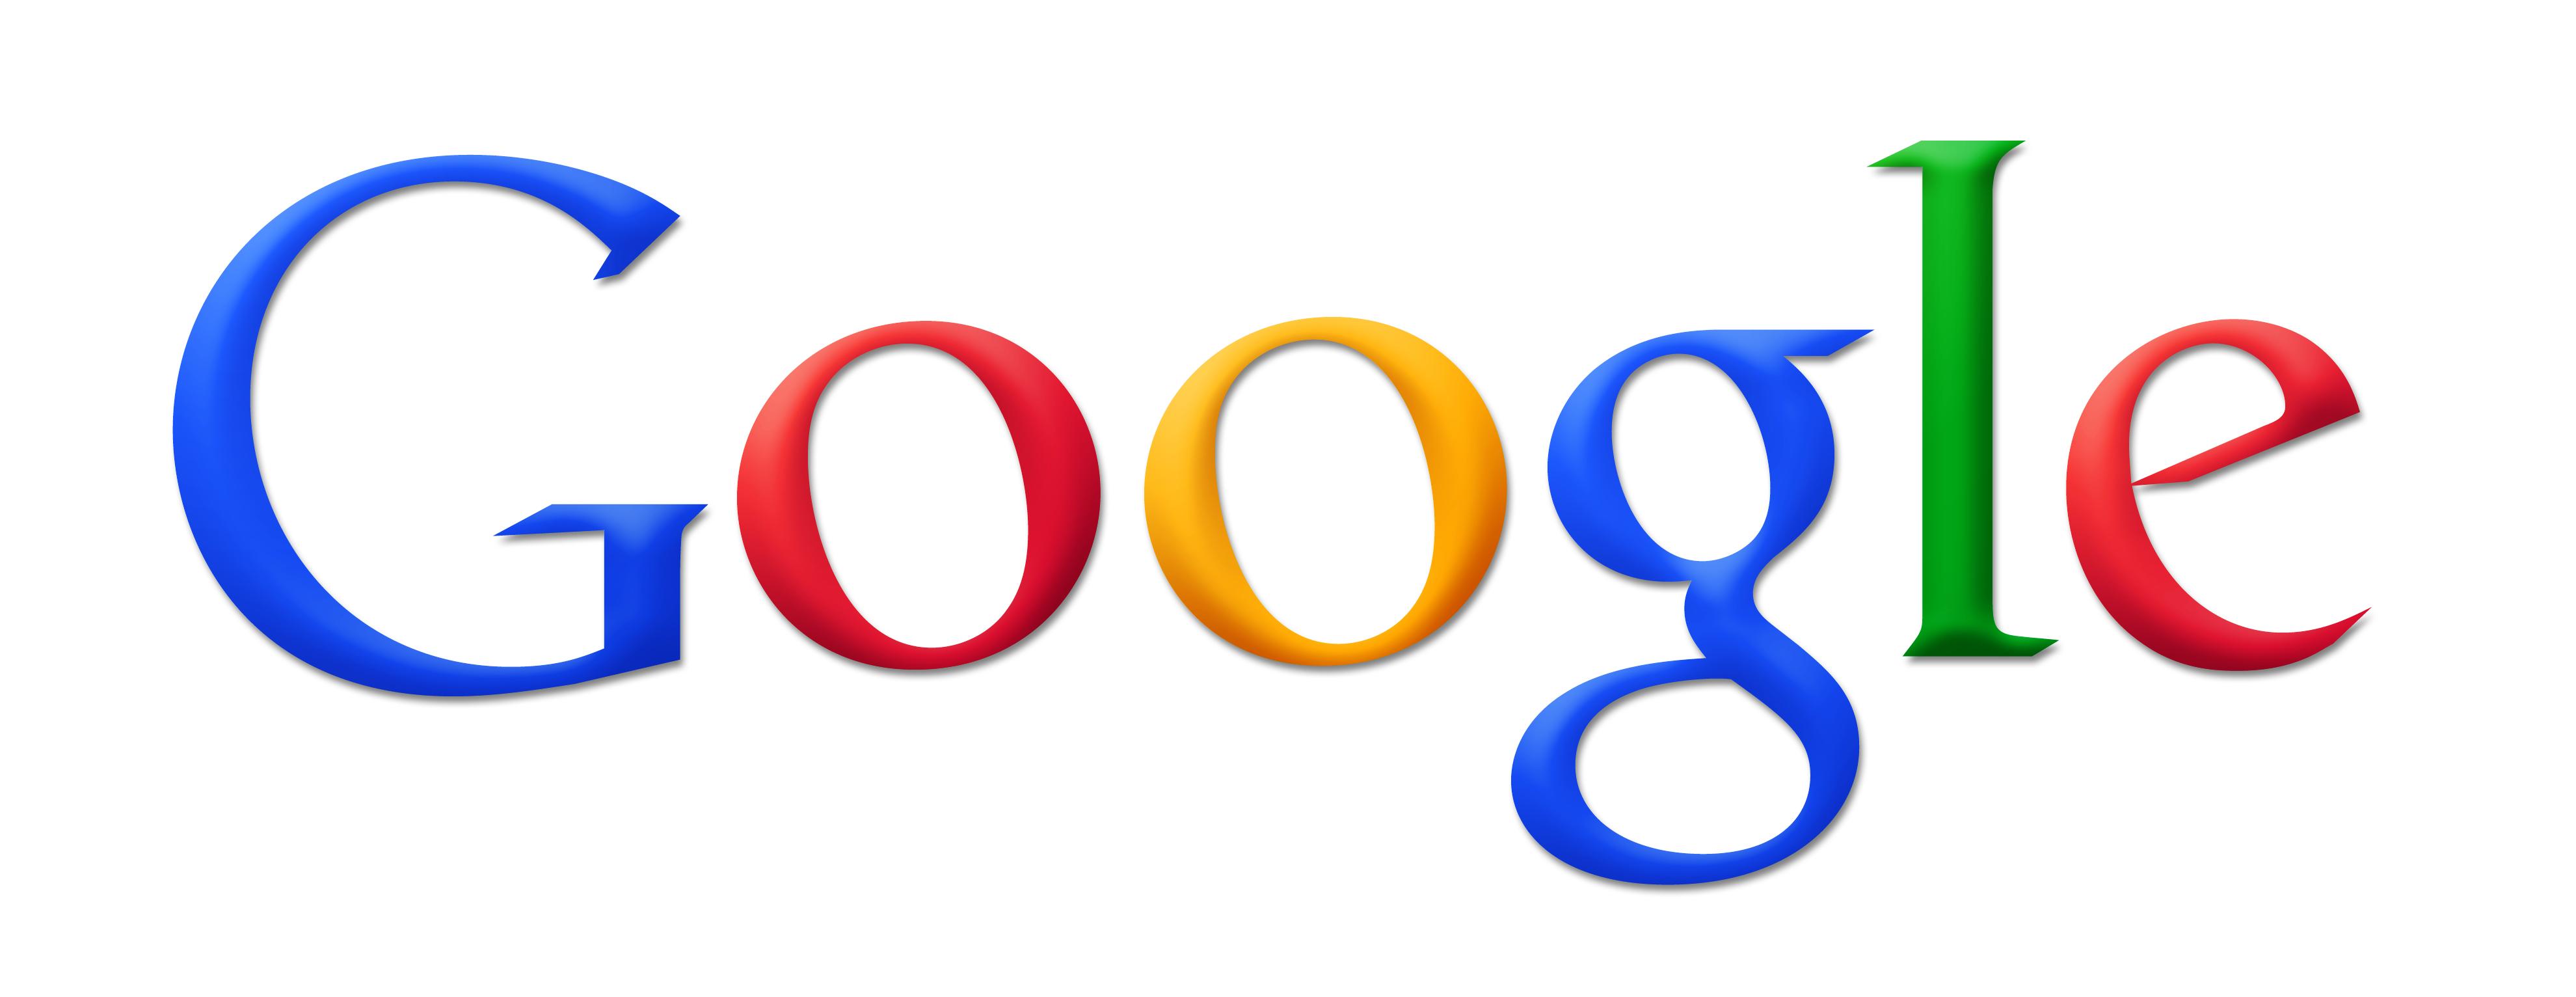 google2010logo